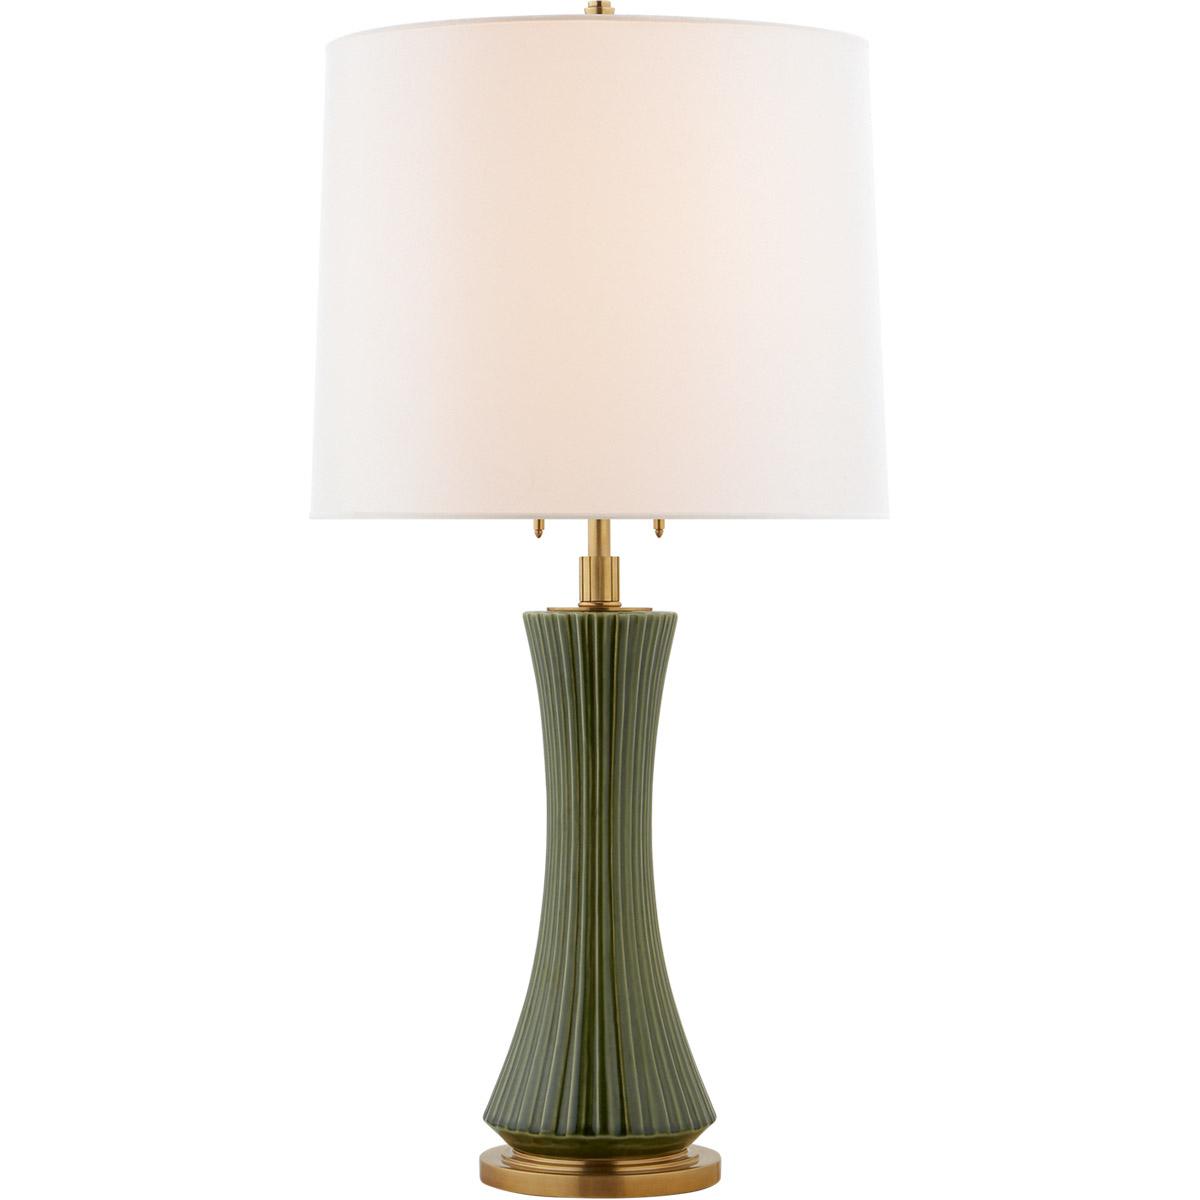 Elena Large Table Lamp